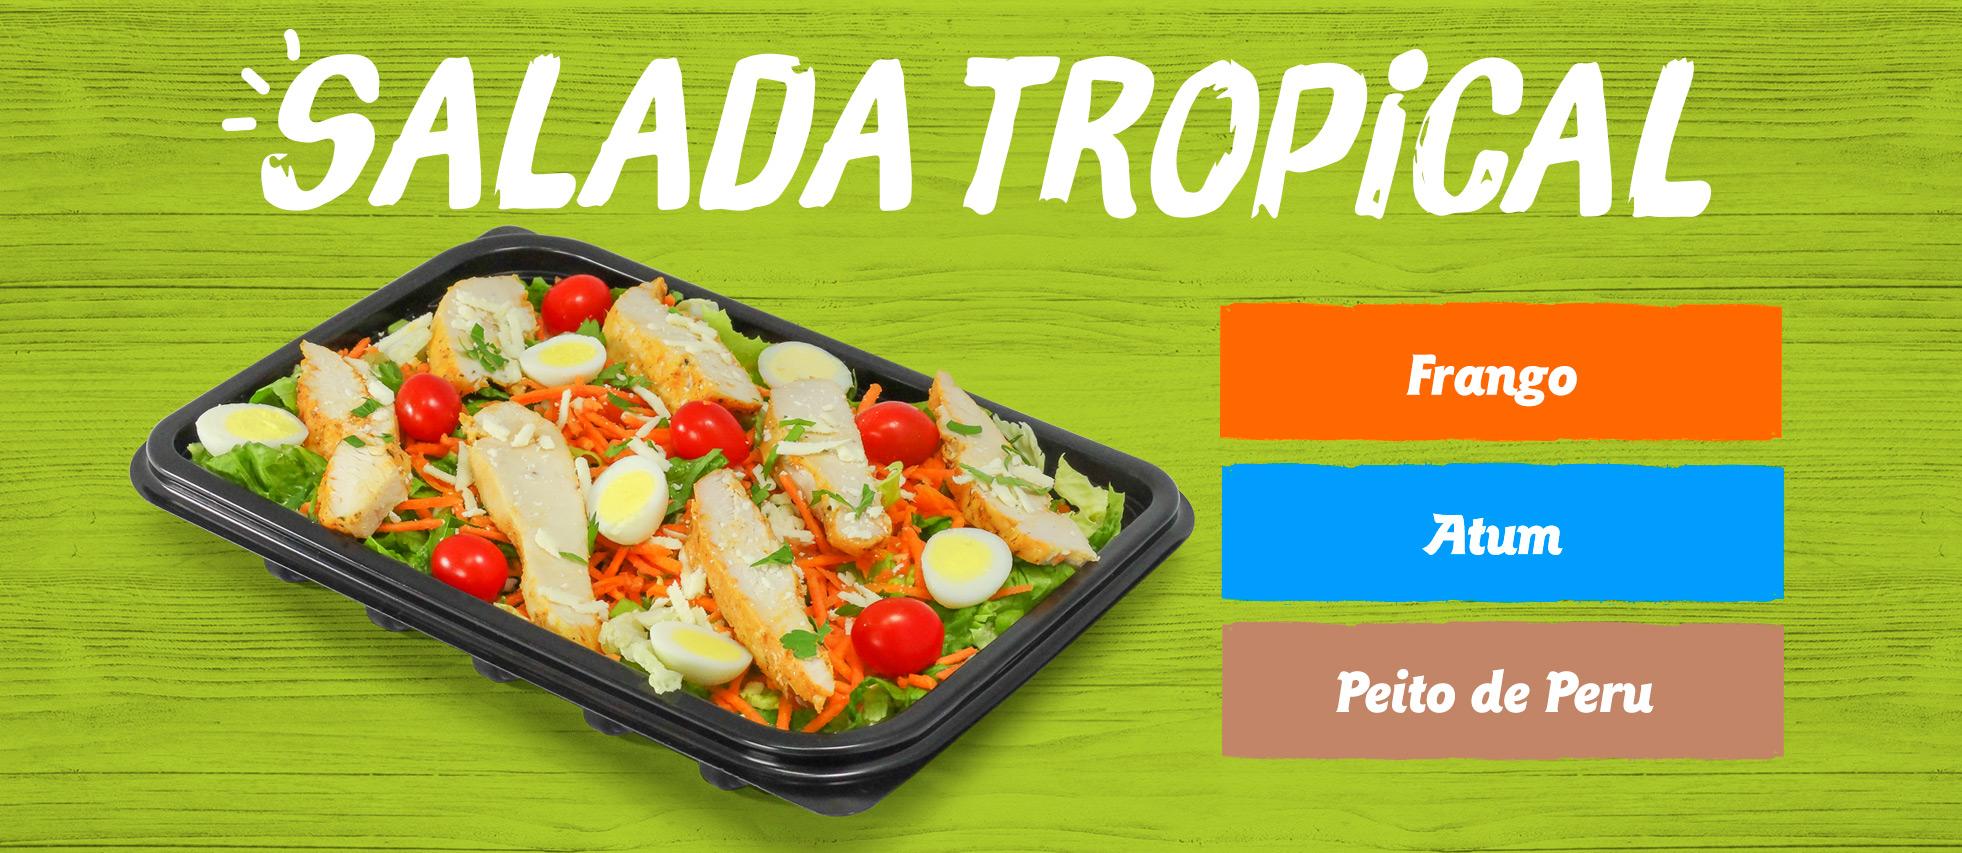 salada Curitiba